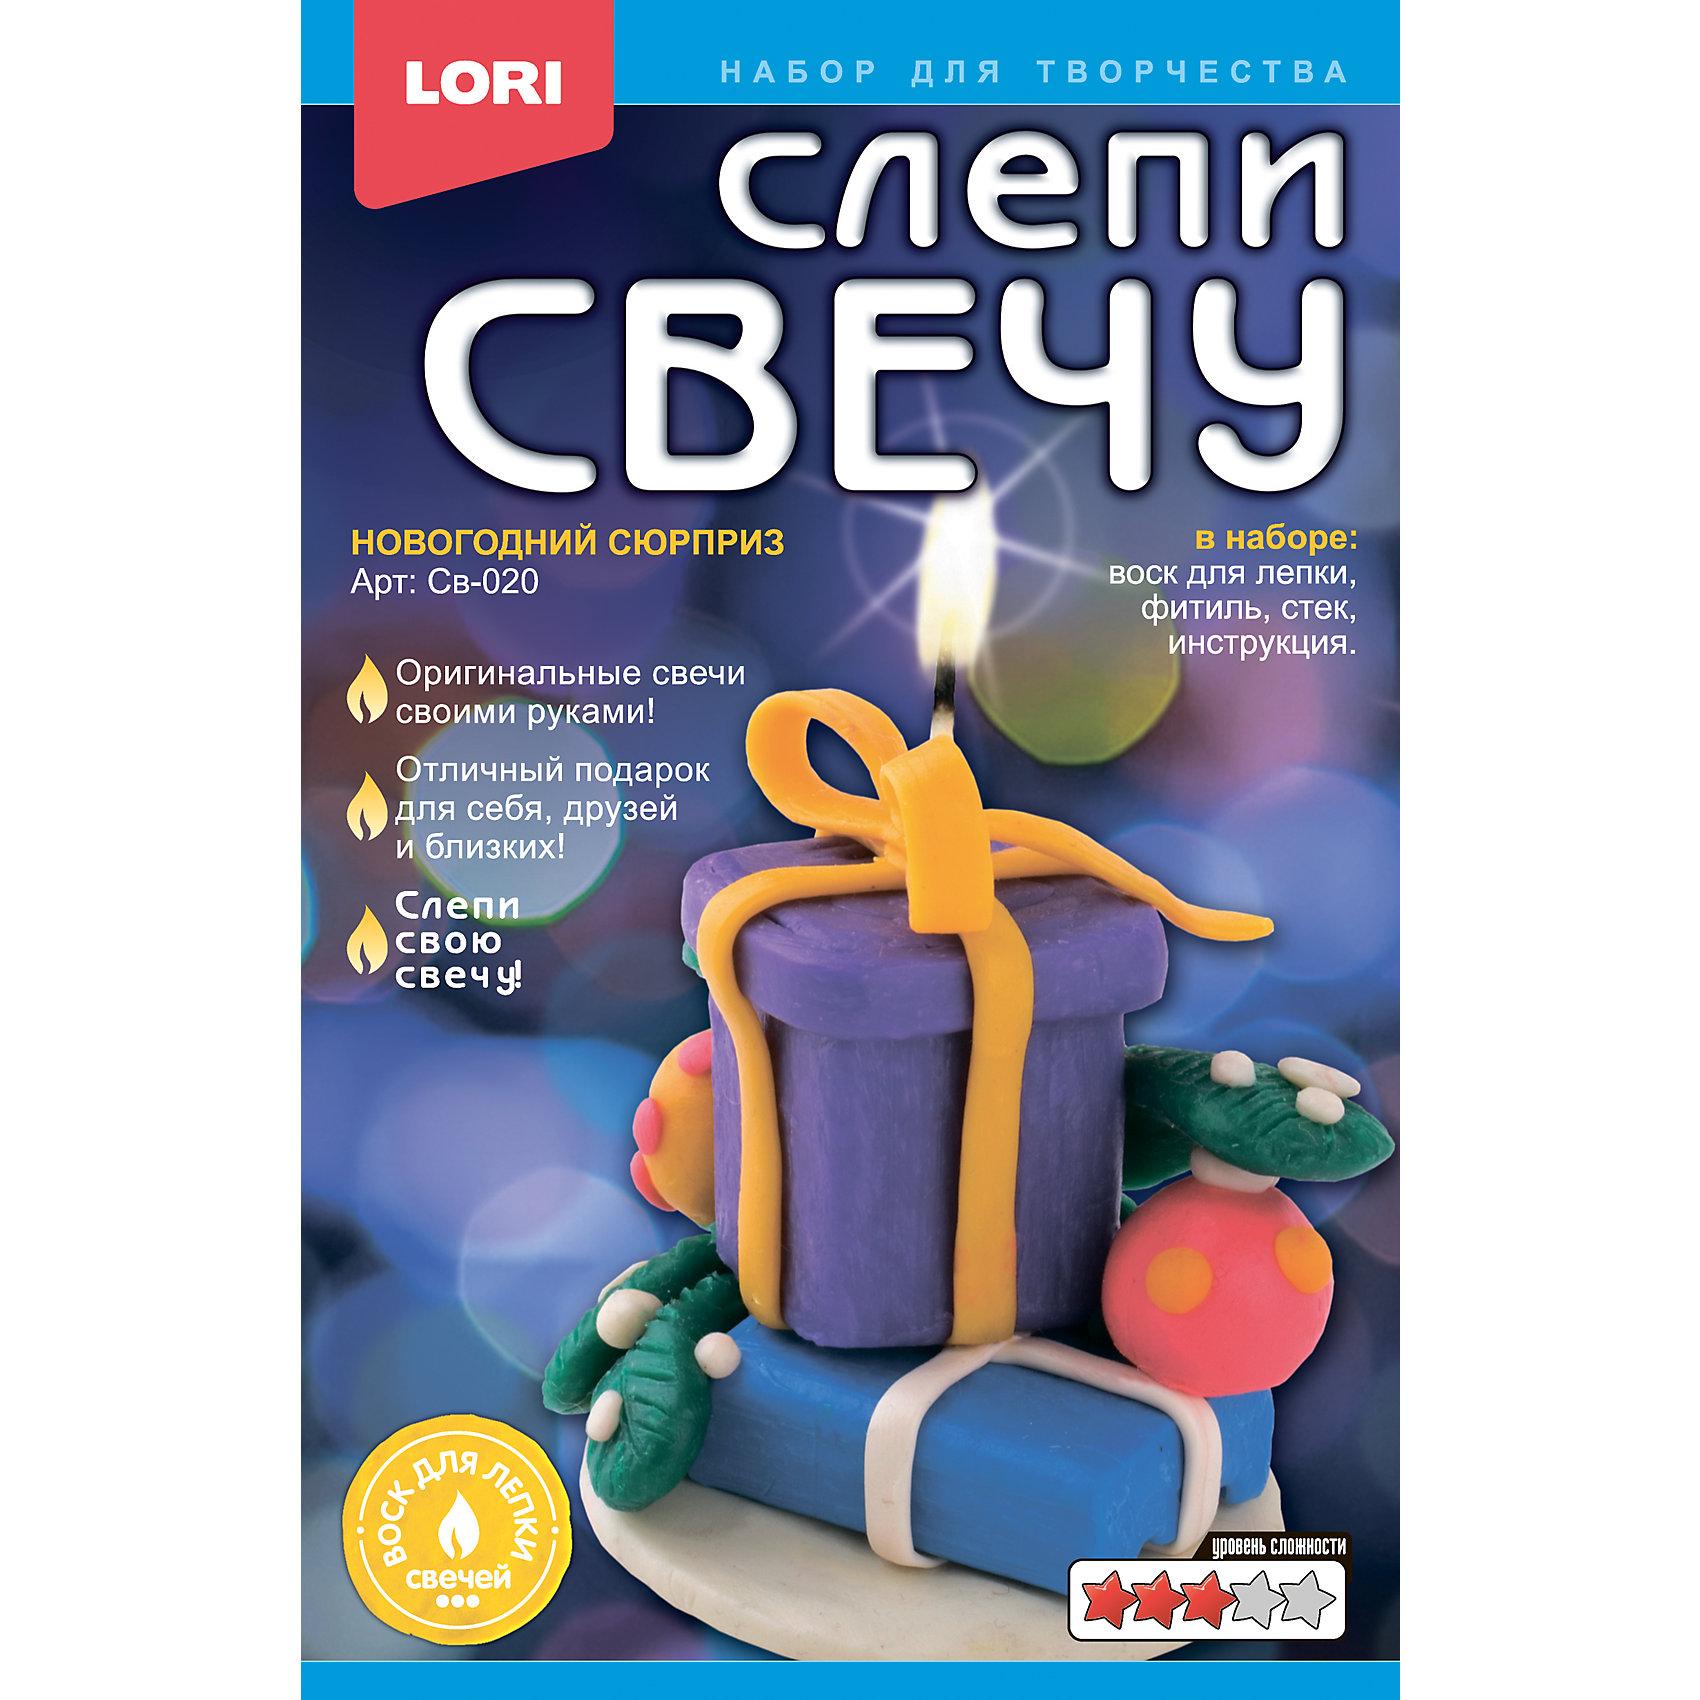 LORI Слепи свечу Новогодний сюрприз lori слепи свечу дары моря lori